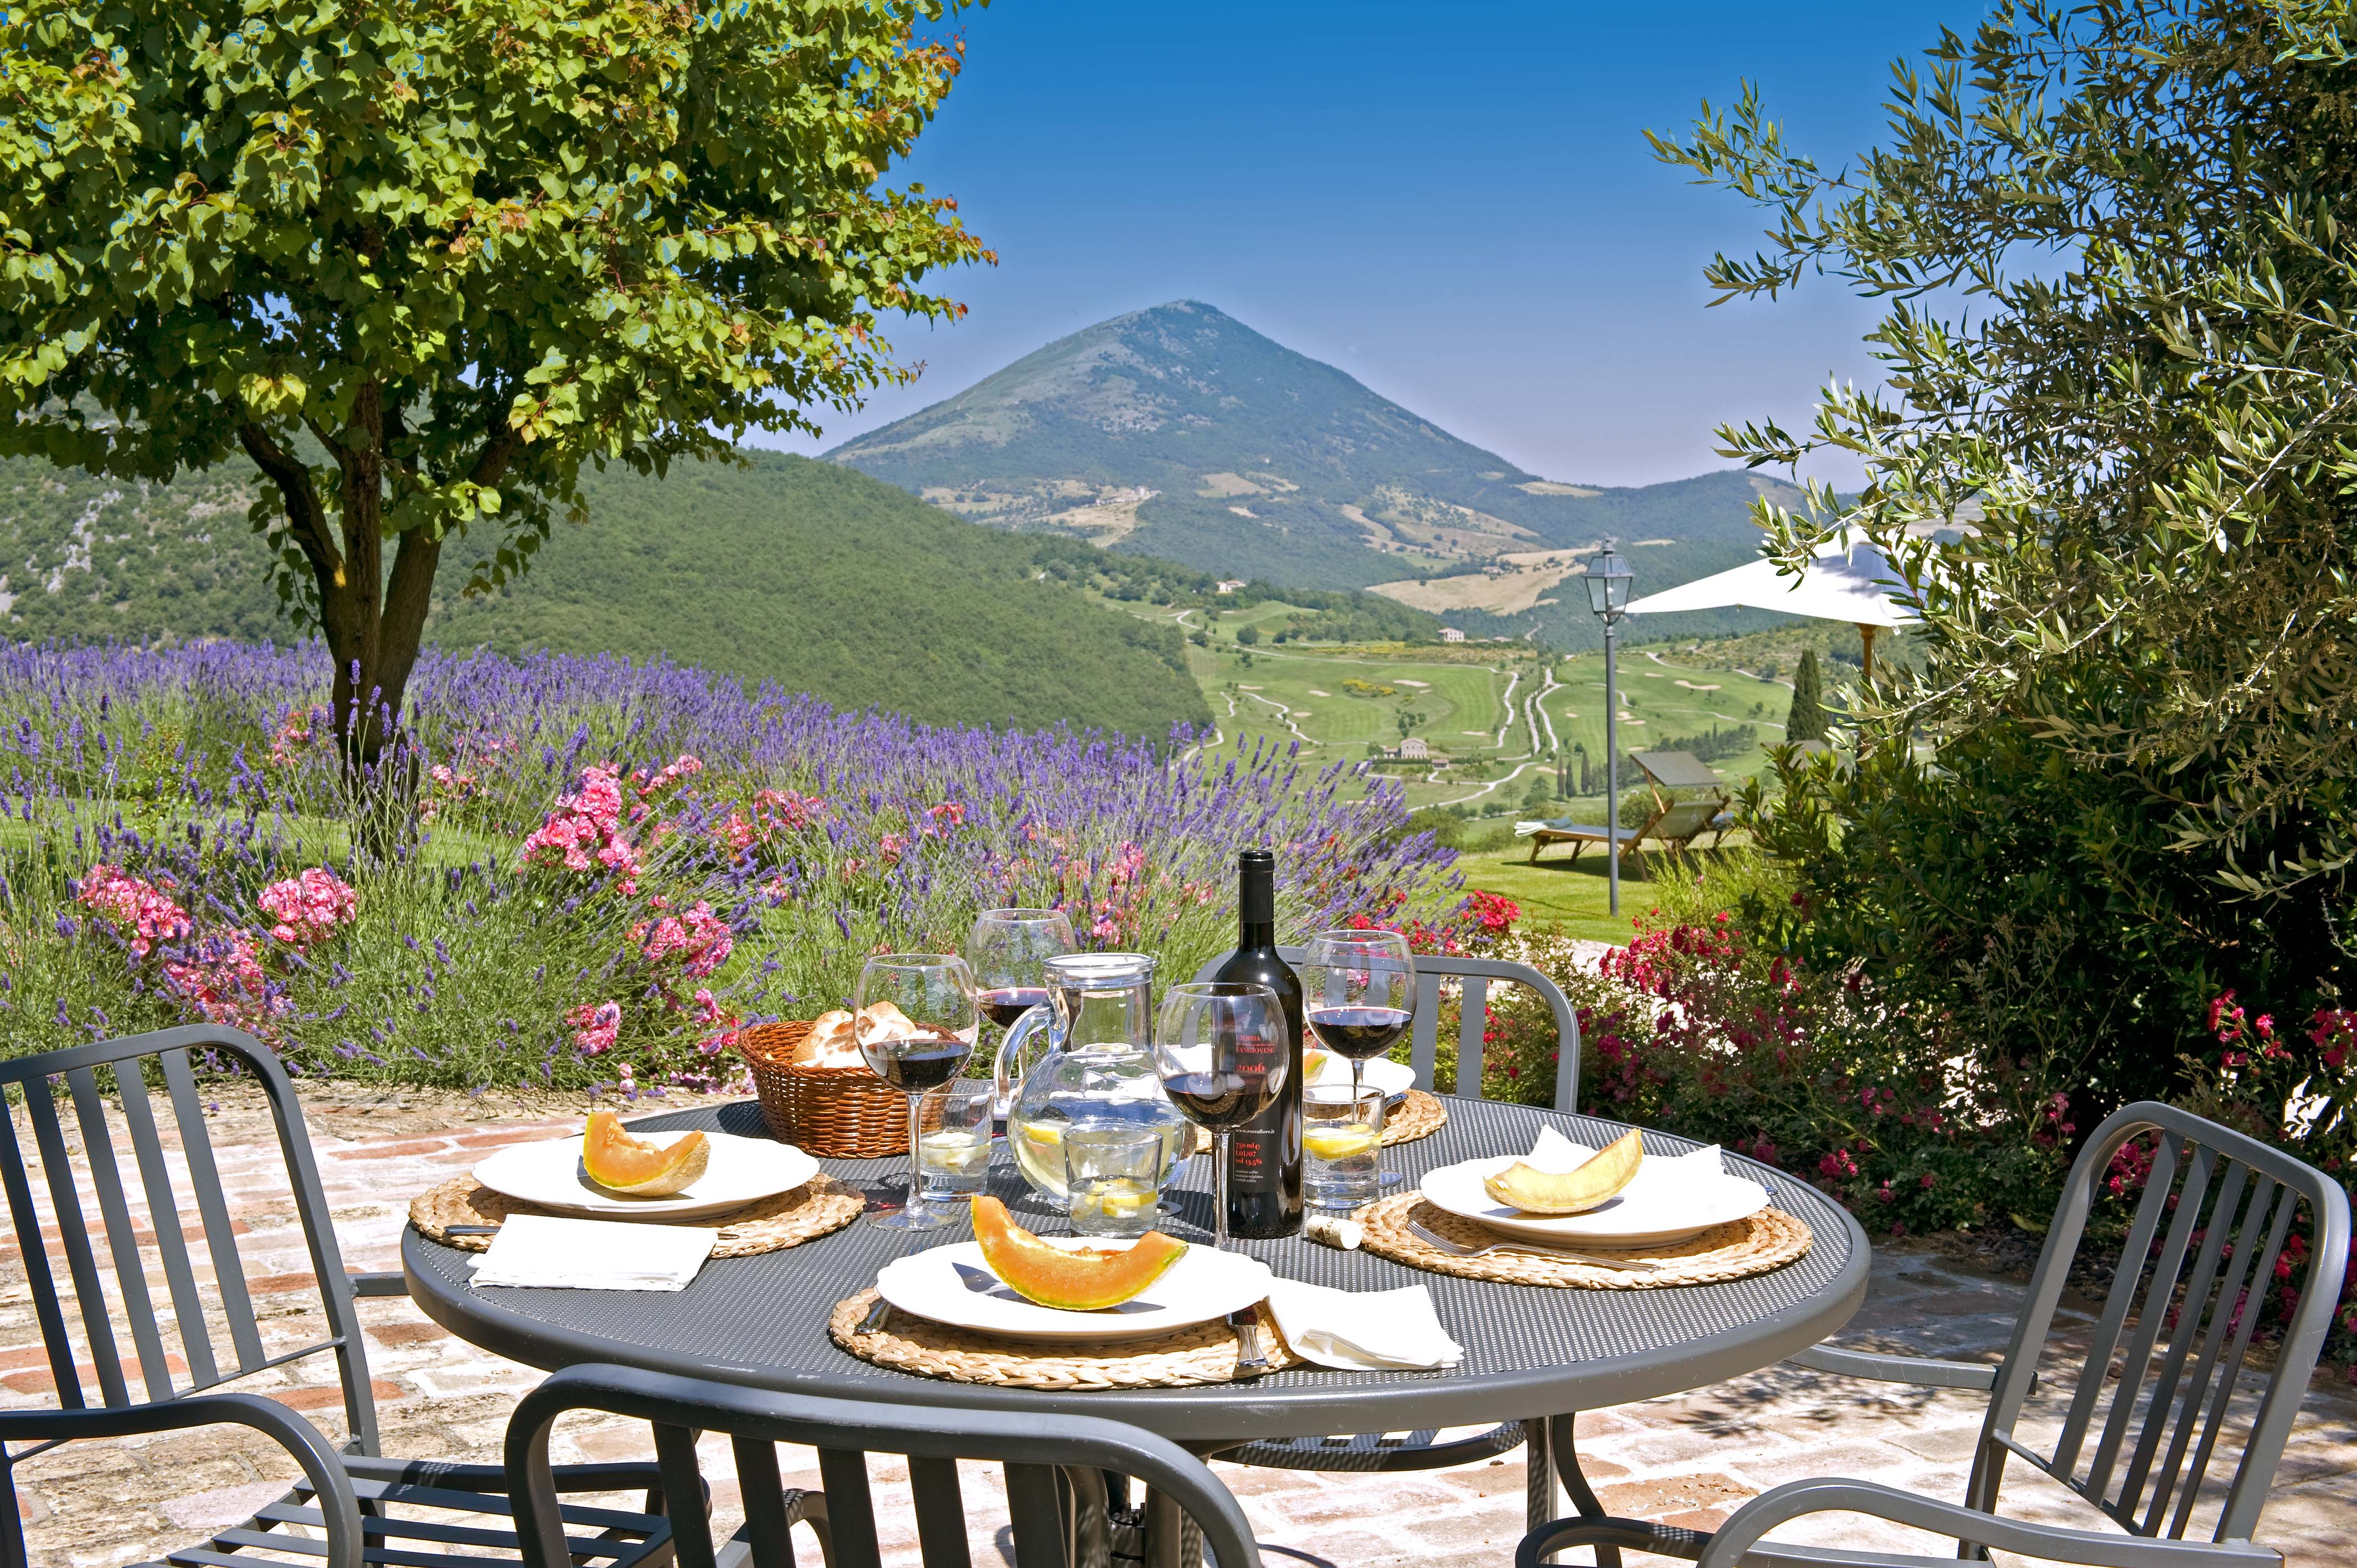 Villa-Subtilia-Italy-Olivers-Travels (2)